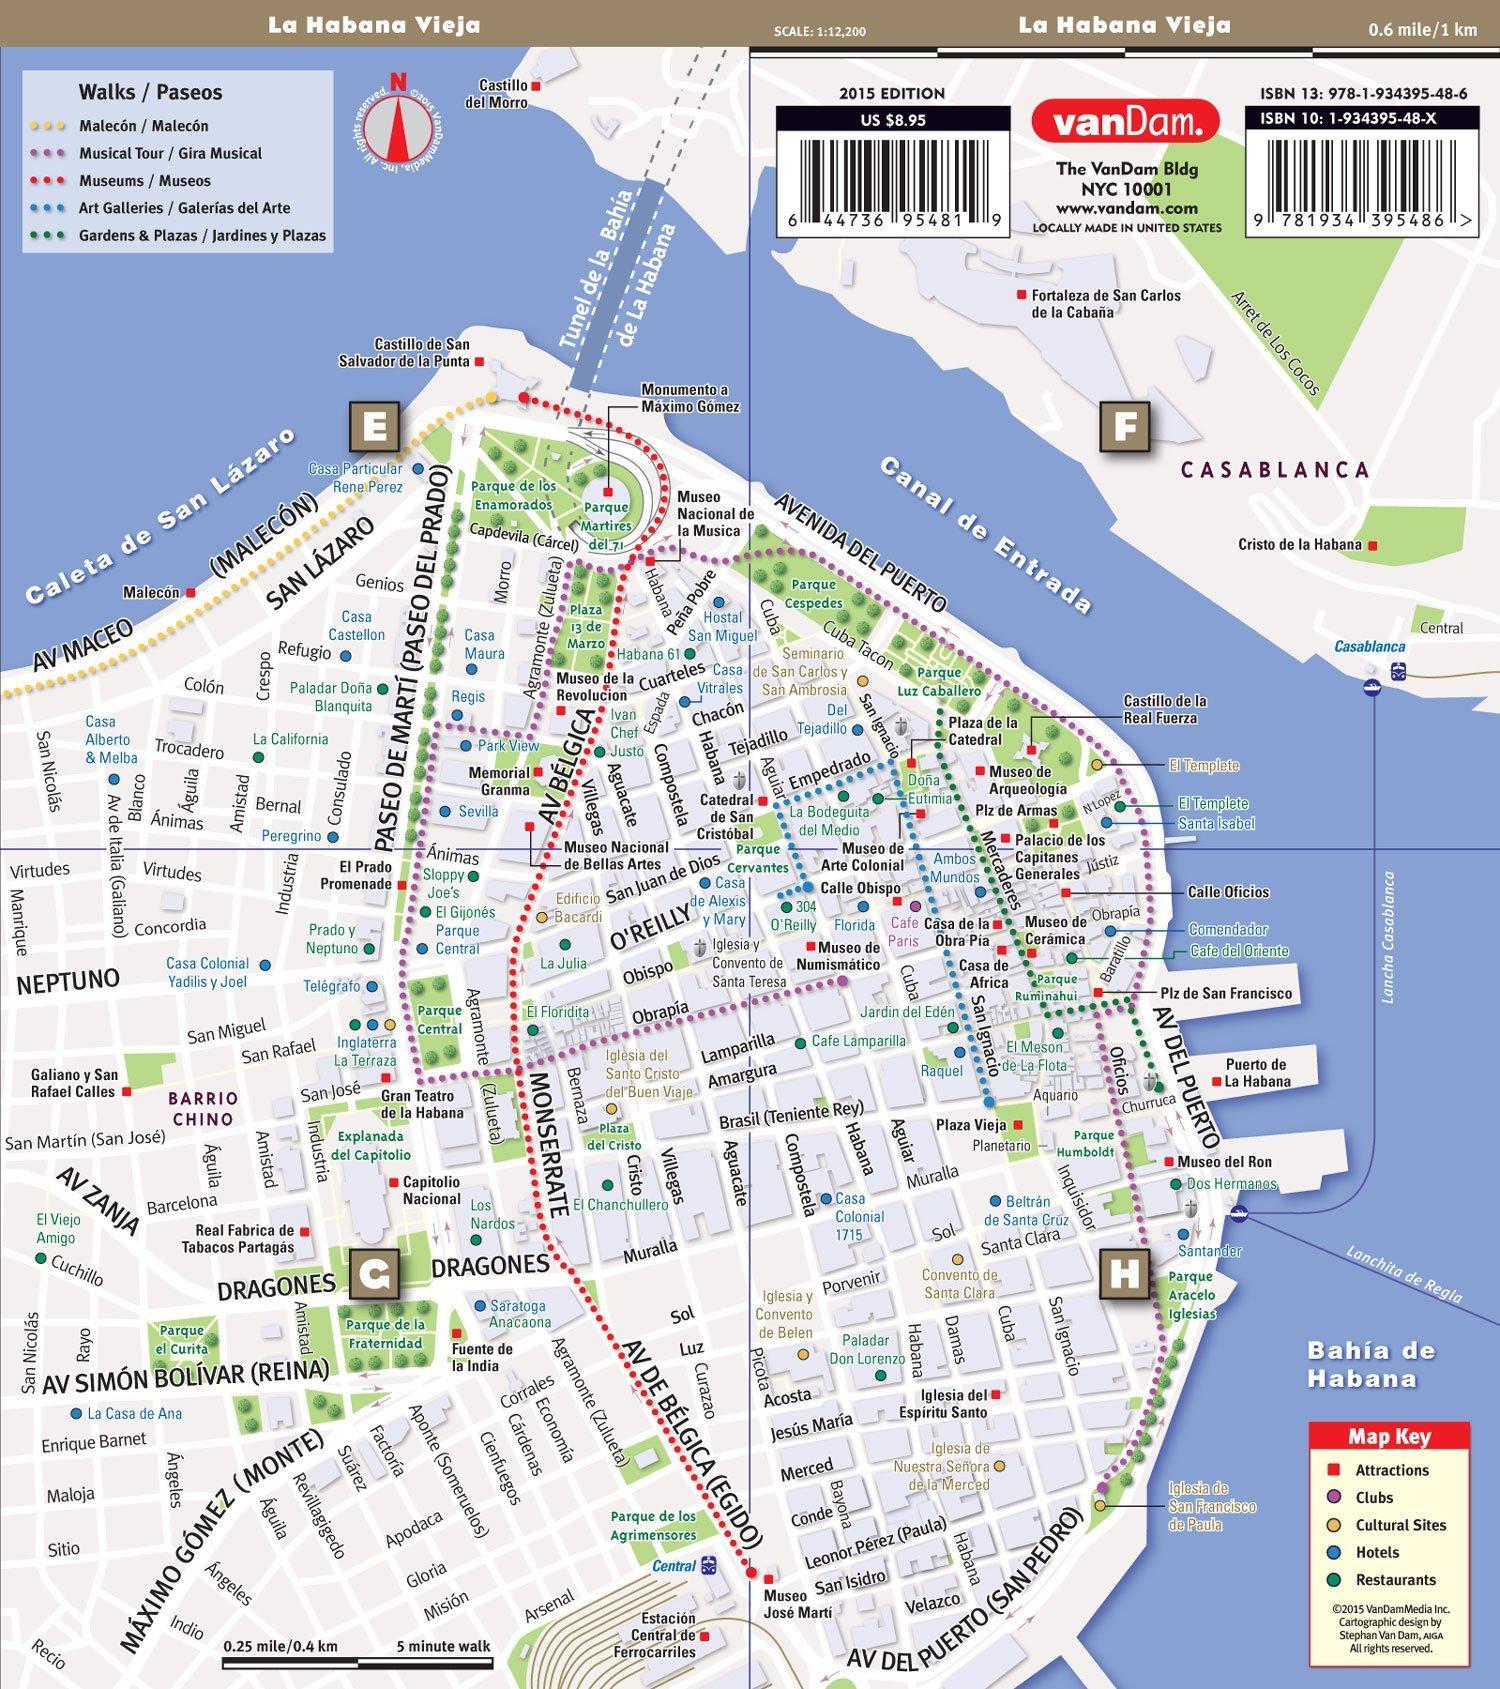 StreetSmart Havana Map by VanDam - City Street Map of Havana - Laminated  folding pocket size city travel map (English and Spanish Edition) 2018  Edition: ...